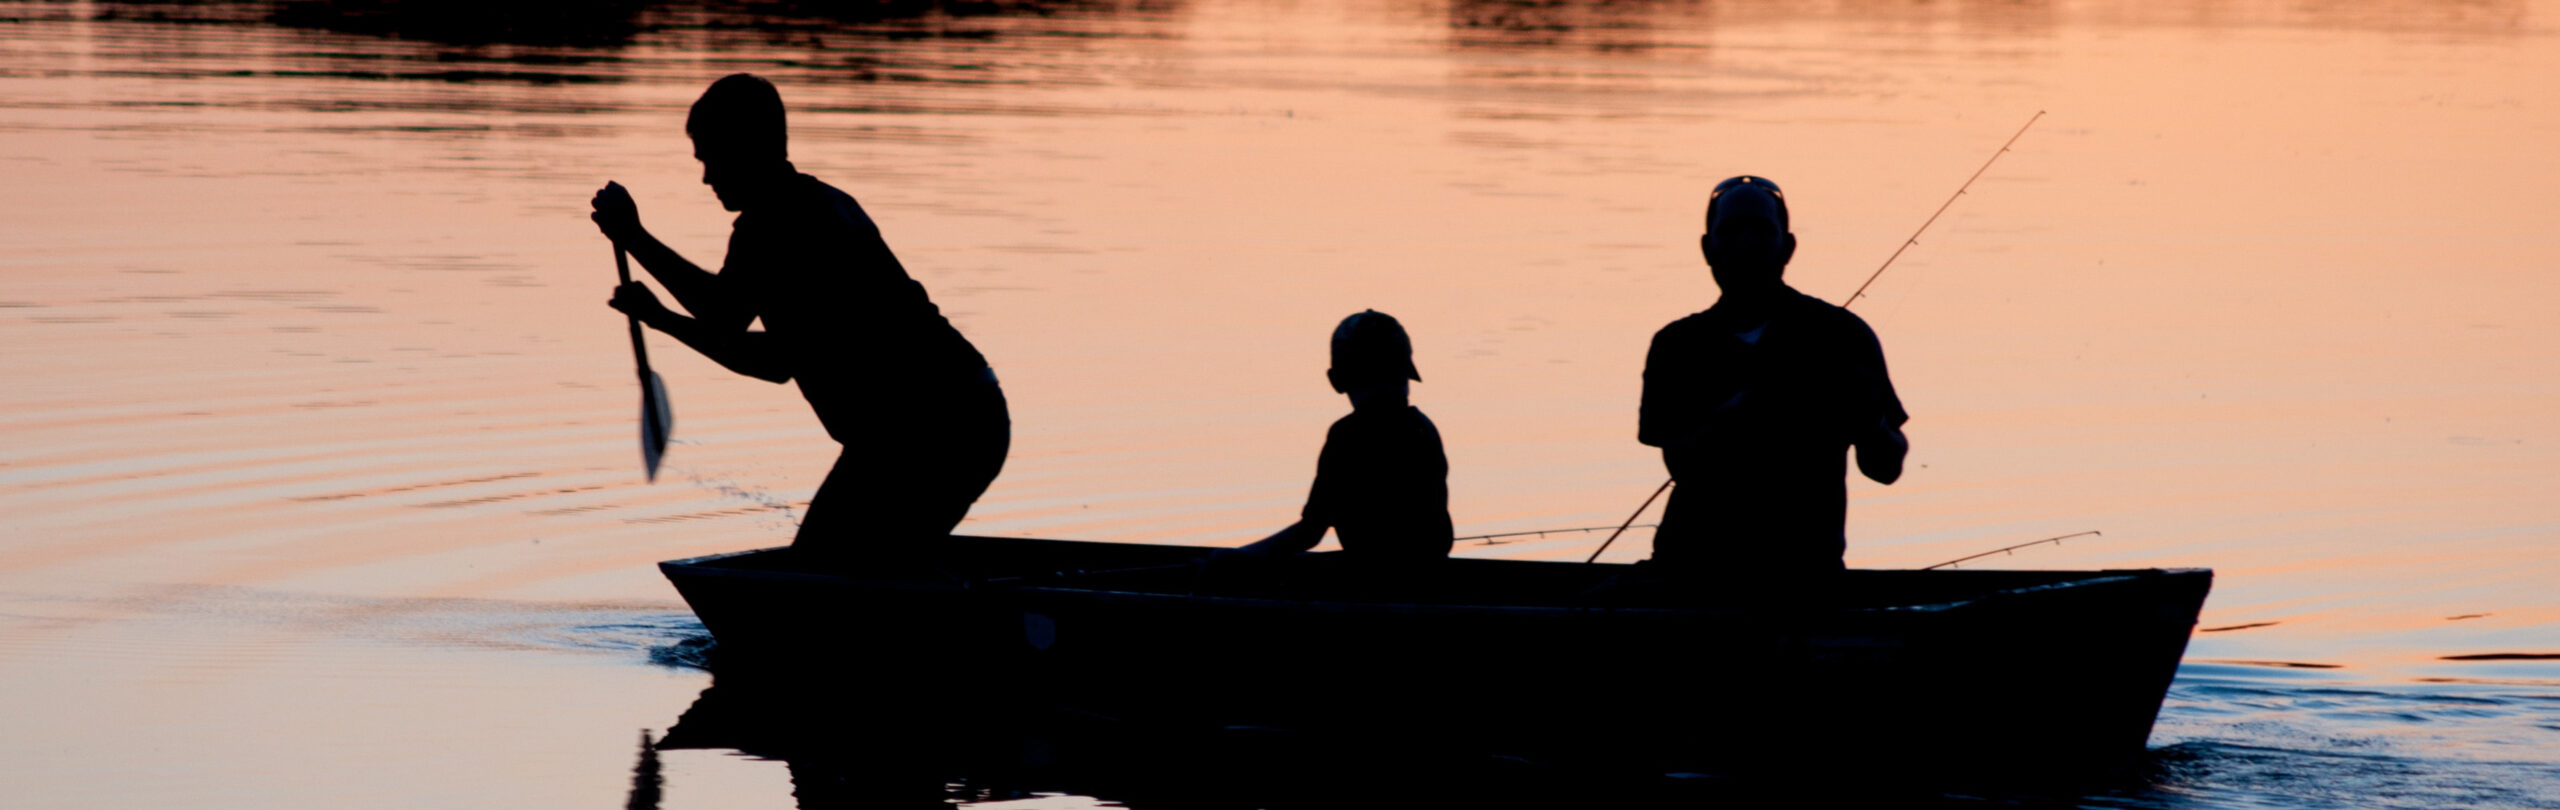 Family Fishing at dawn or dusk